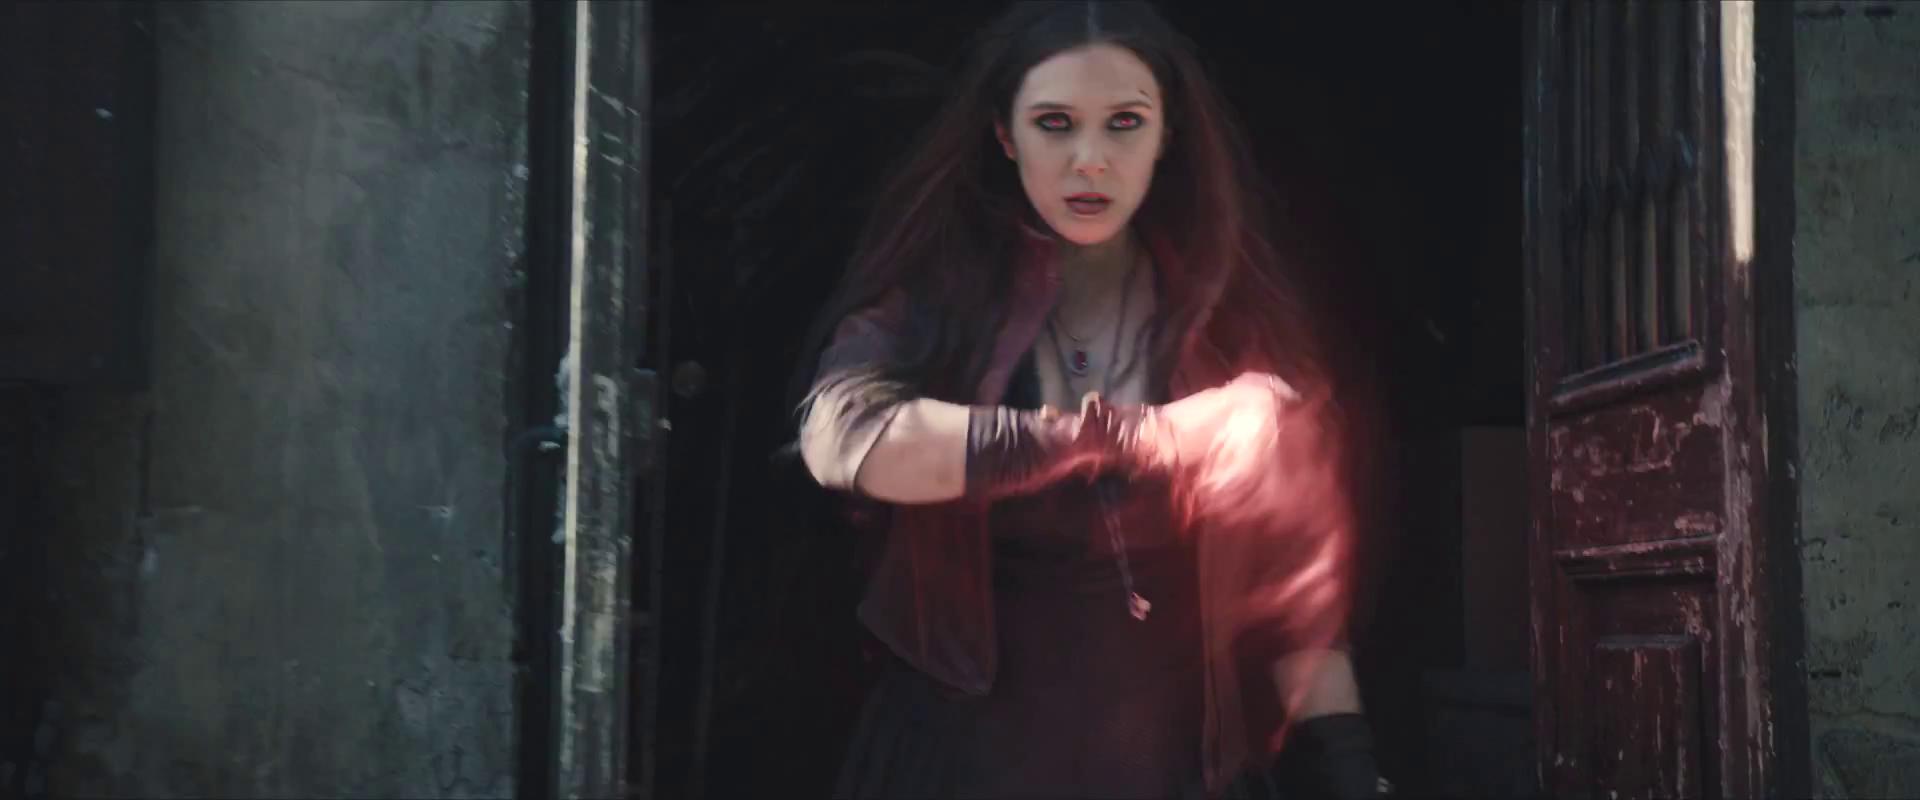 avengers-age-of-ultron-trailer-screengrab-19-elizabeth-olsen.png